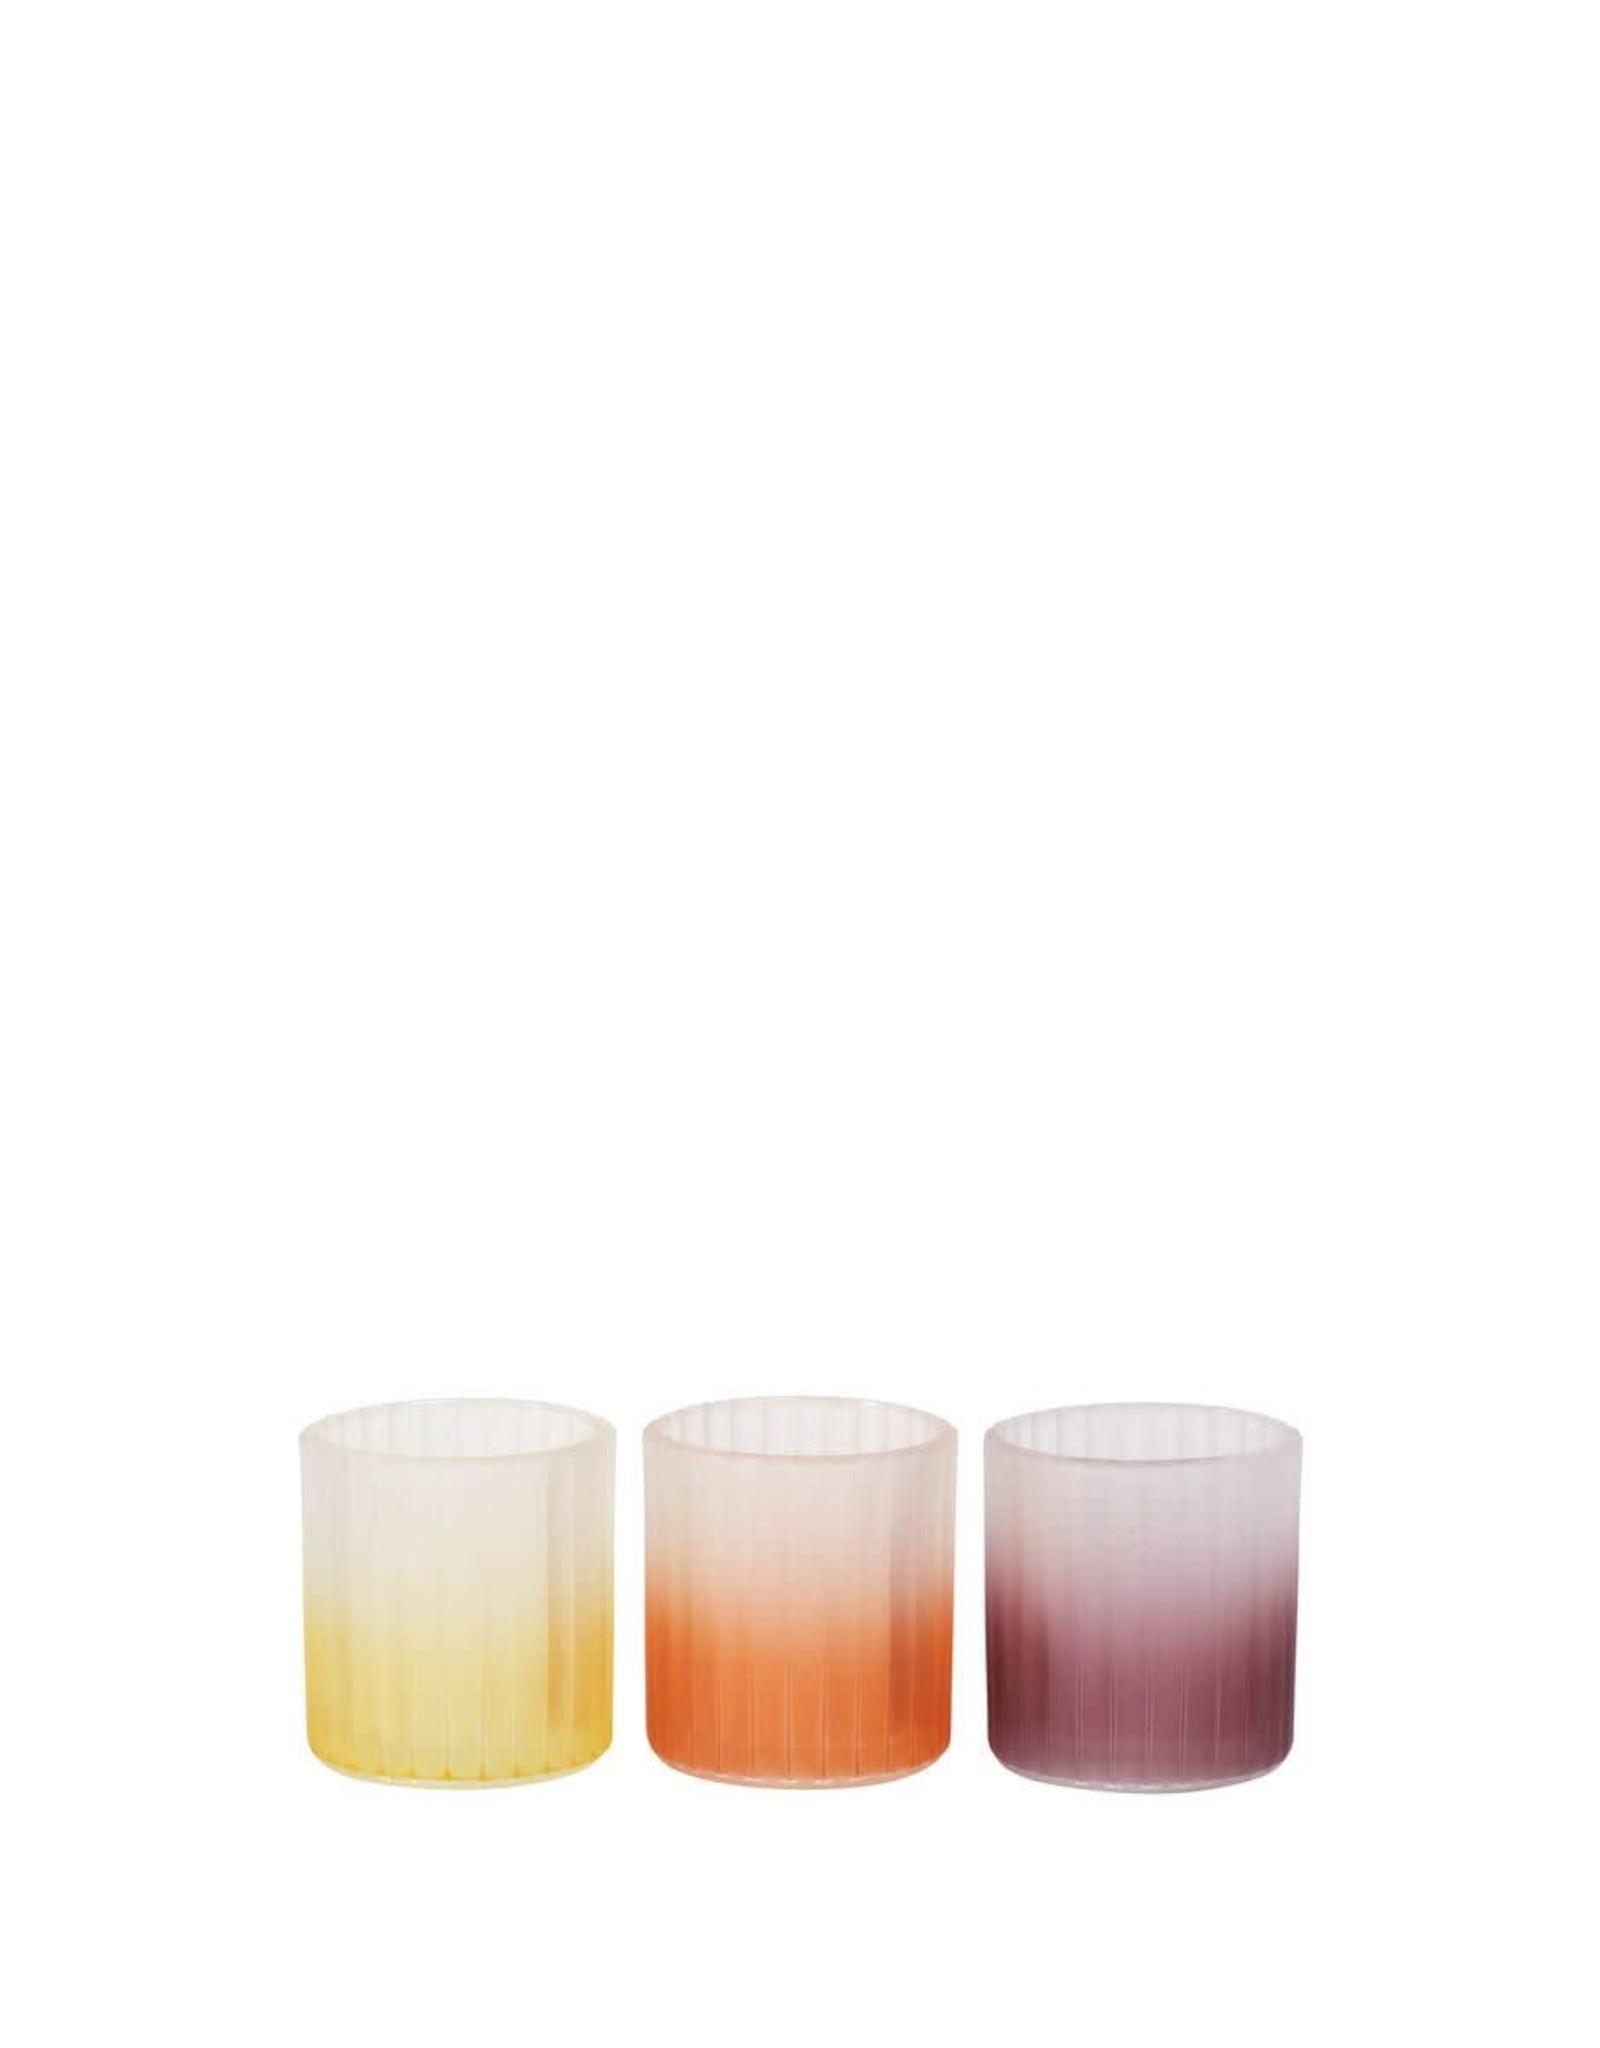 Alflora Waxinehouder D7.5XH10cm Mix Geel/Lila/Oranje Set/3